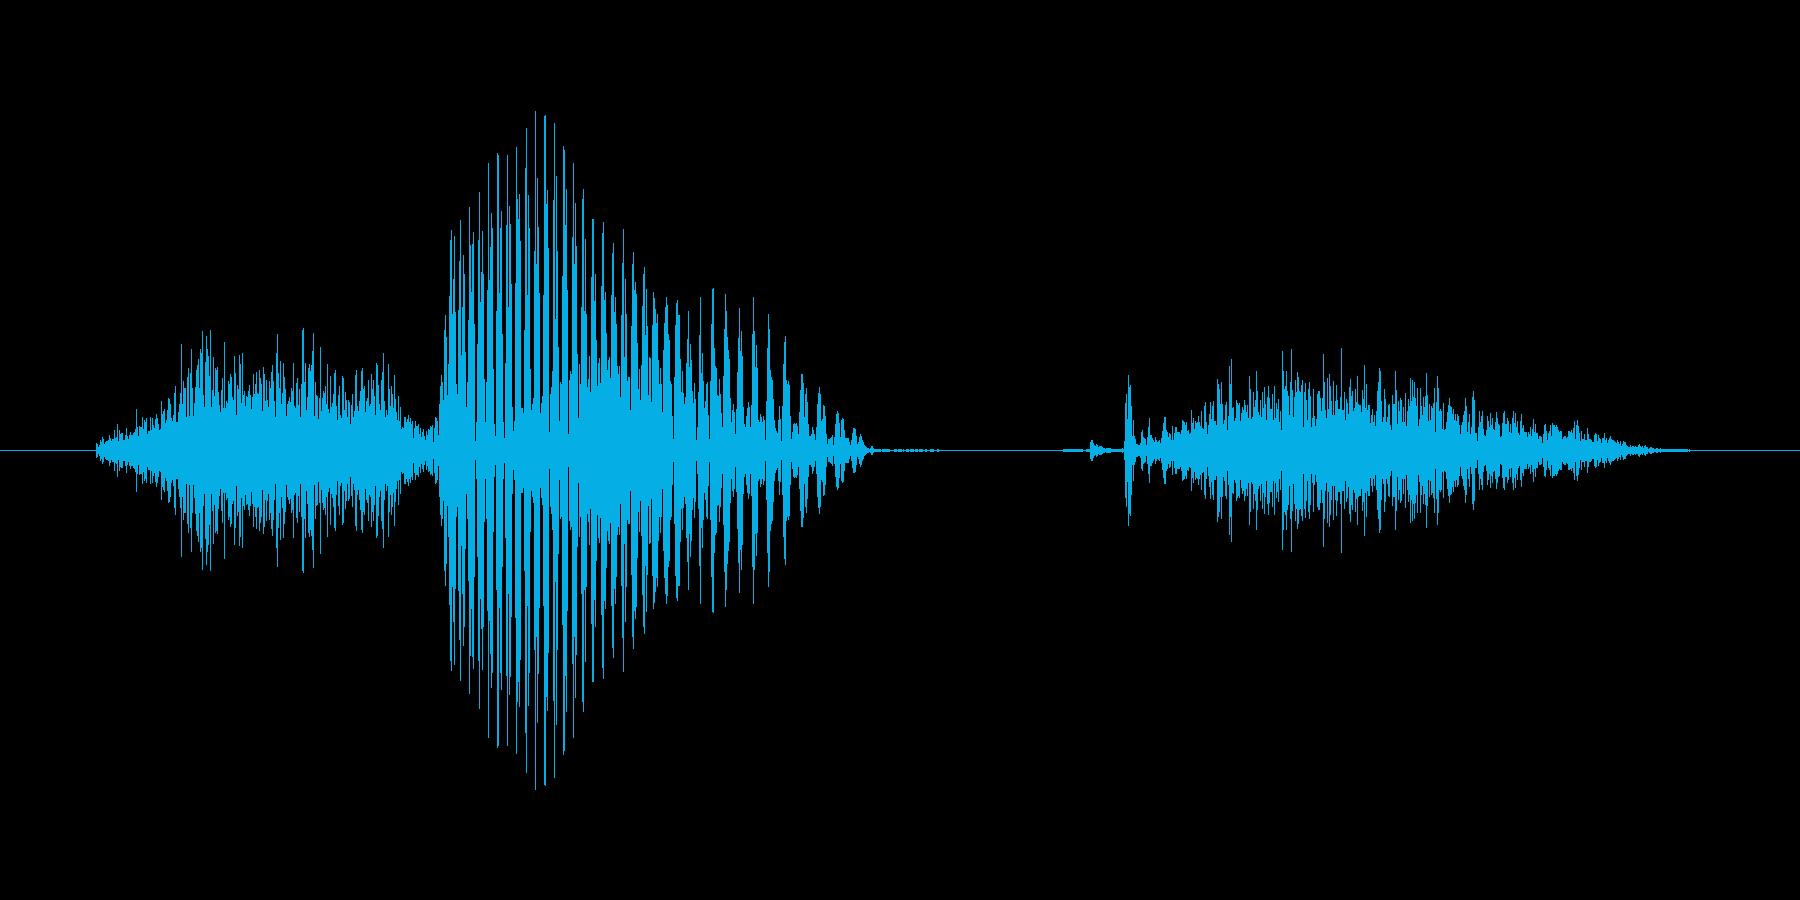 6 (six, 英語、米国女性声優K1)の再生済みの波形